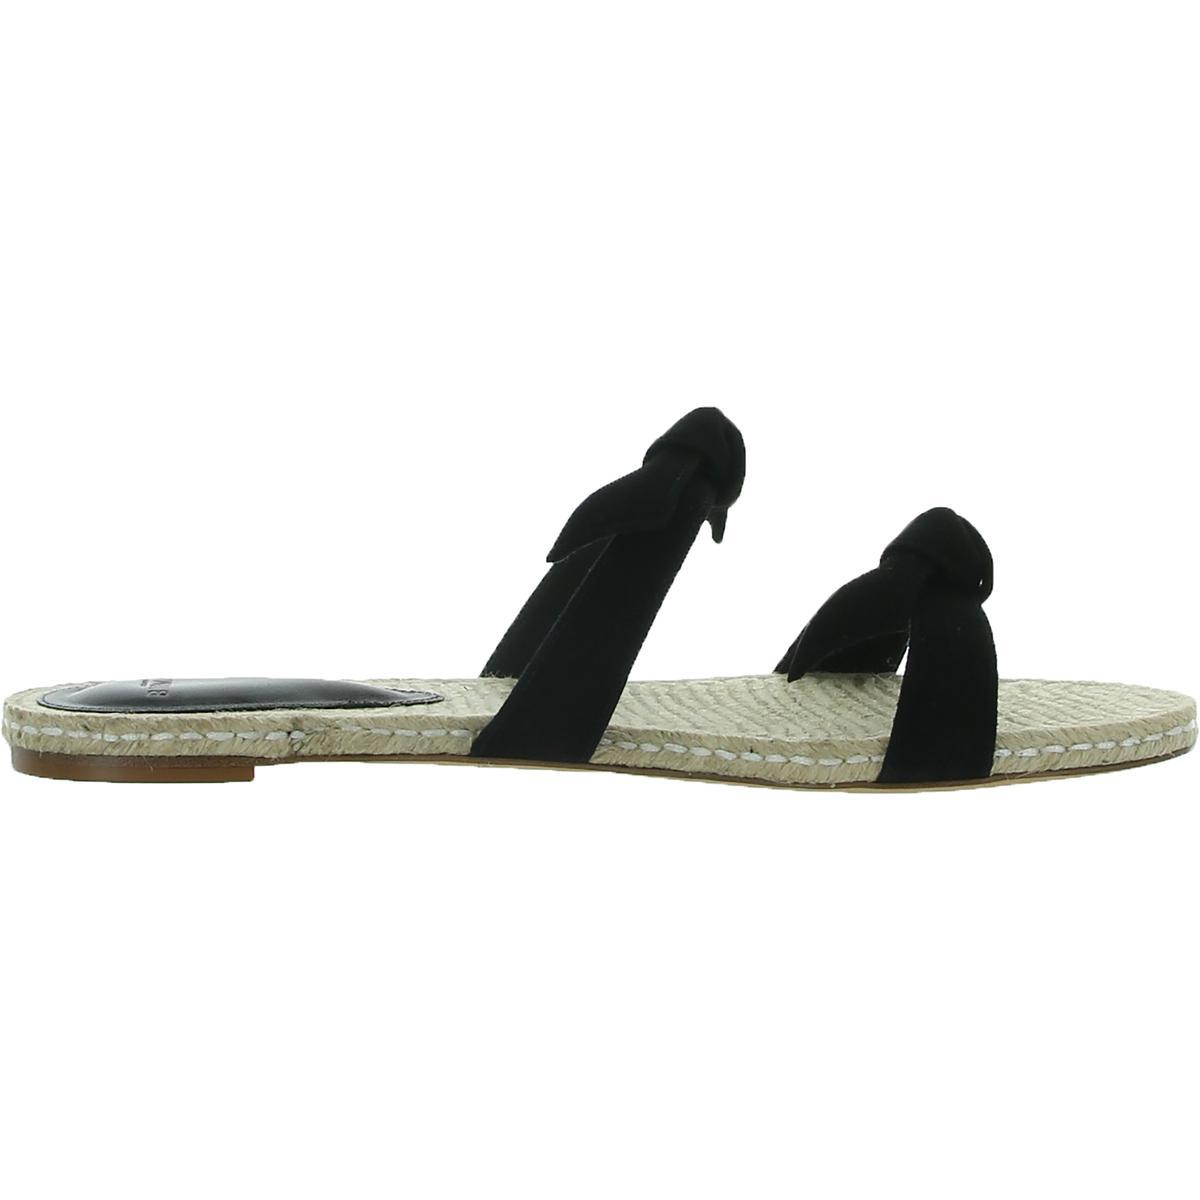 thumbnail 6 - Alexandre Birman Womens Clarita Leather Flats Slide Sandals Shoes BHFO 6244